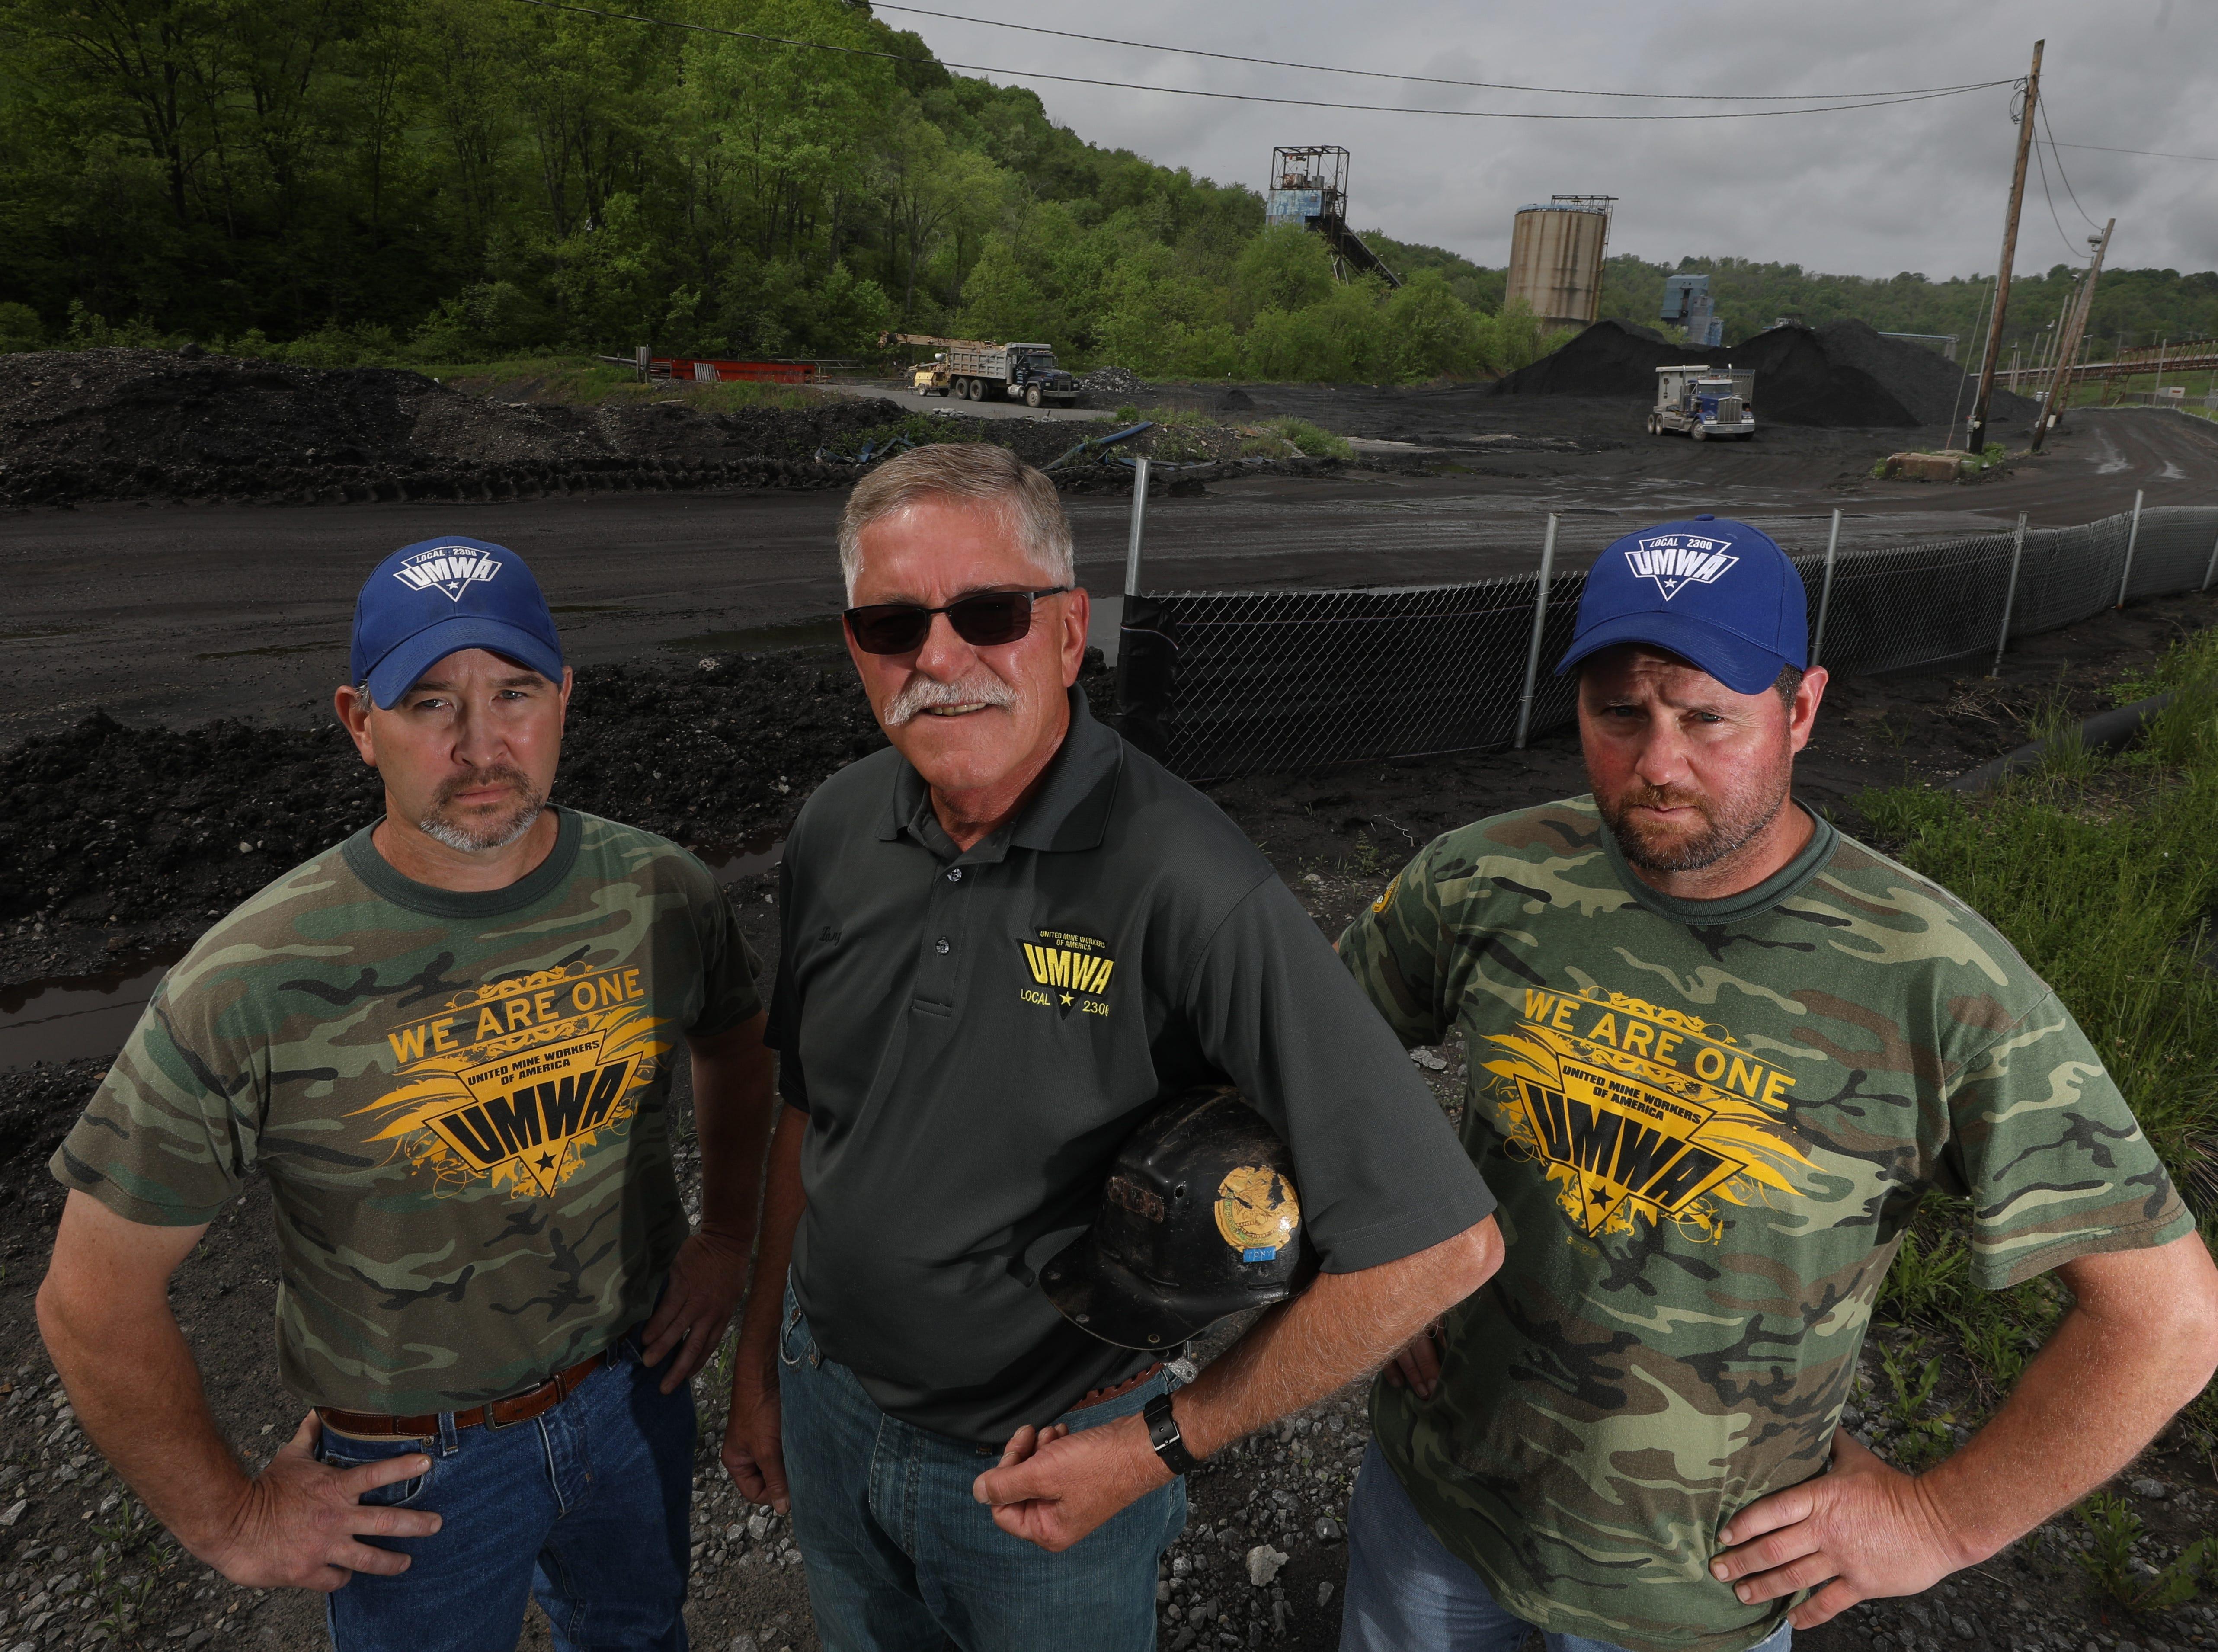 From left, Chad Wendell, Tony Brnusak and Jim Burk outside the Cumberland Mine south of Waynesburg, Pennsylvania.